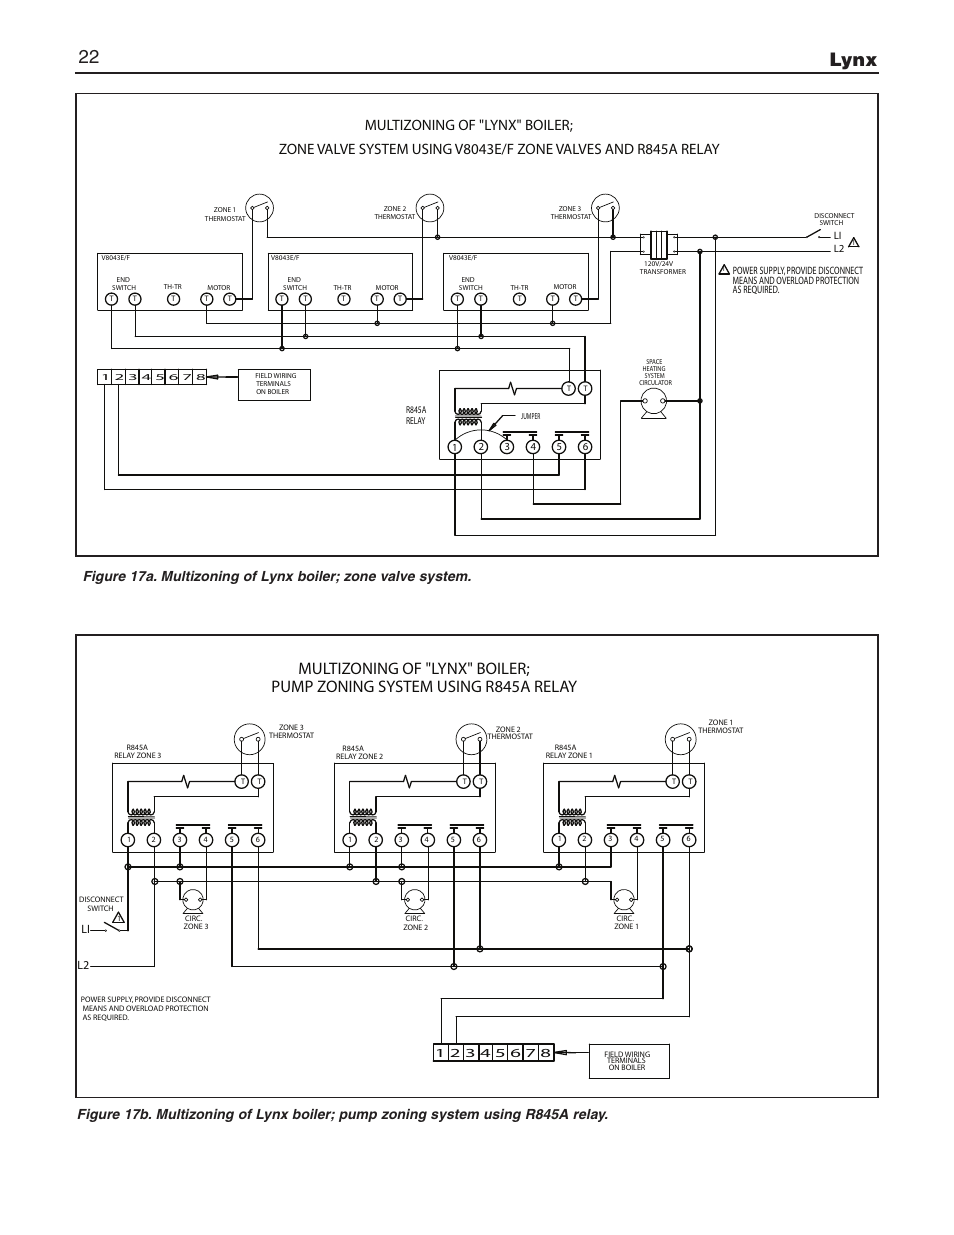 medium resolution of zone valve wiring diagram slant fin wiring library zone valve wiring schematic lynx 22 li